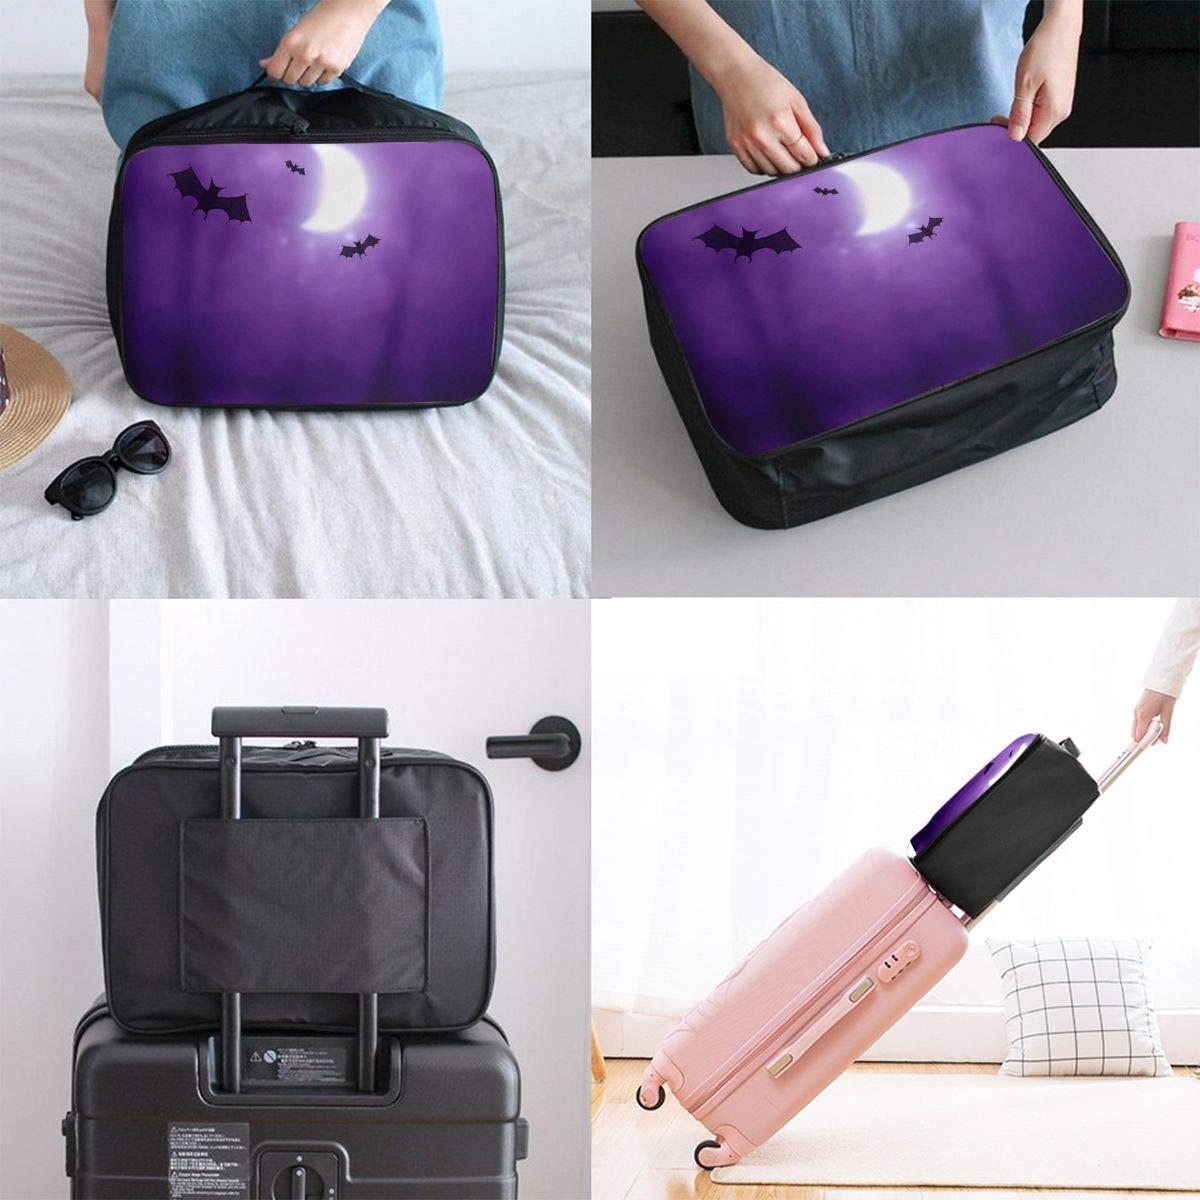 Travel Luggage Duffle Bag Lightweight Portable Handbag Purple Bat Moon Large Capacity Waterproof Foldable Storage Tote